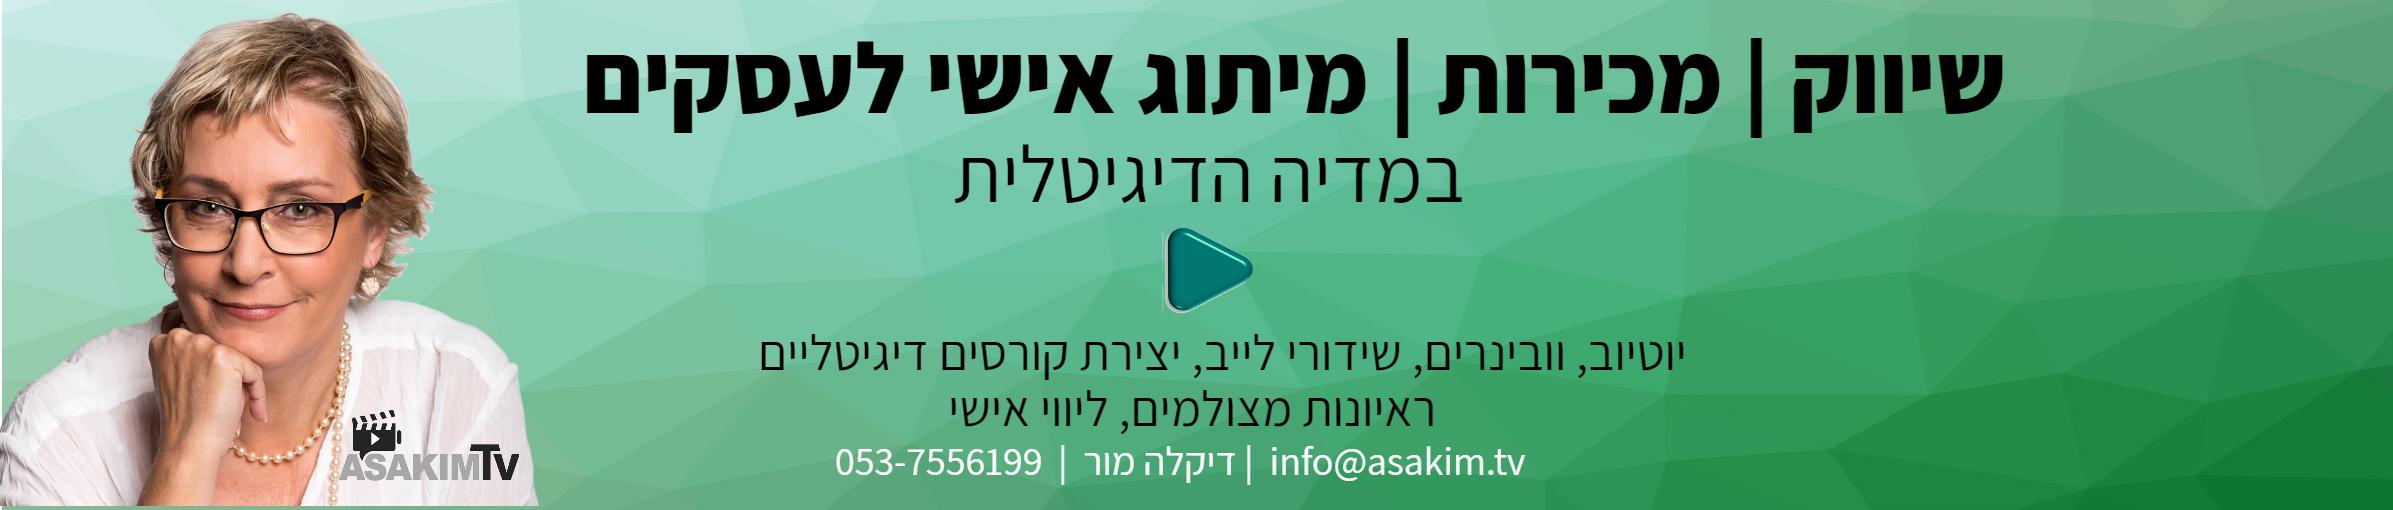 website banner1